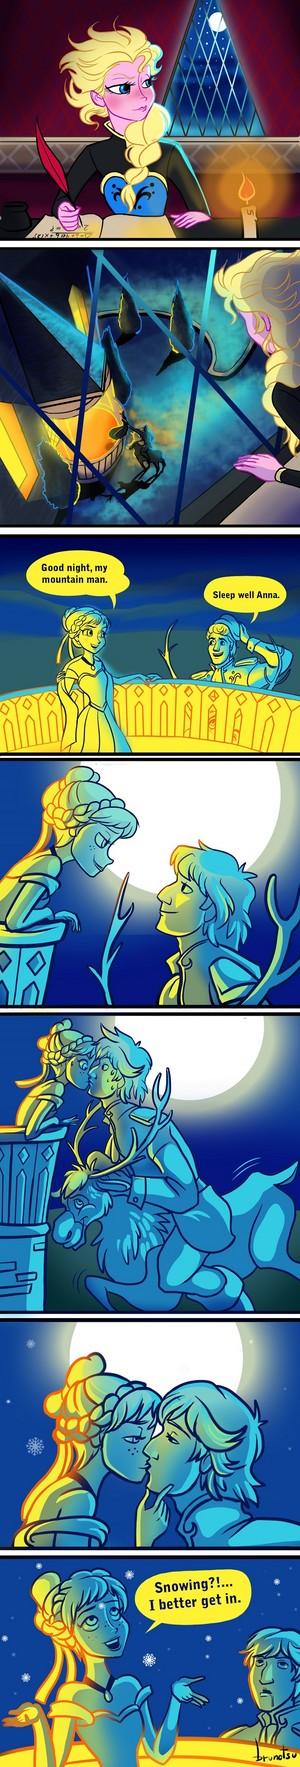 A Frozen Story